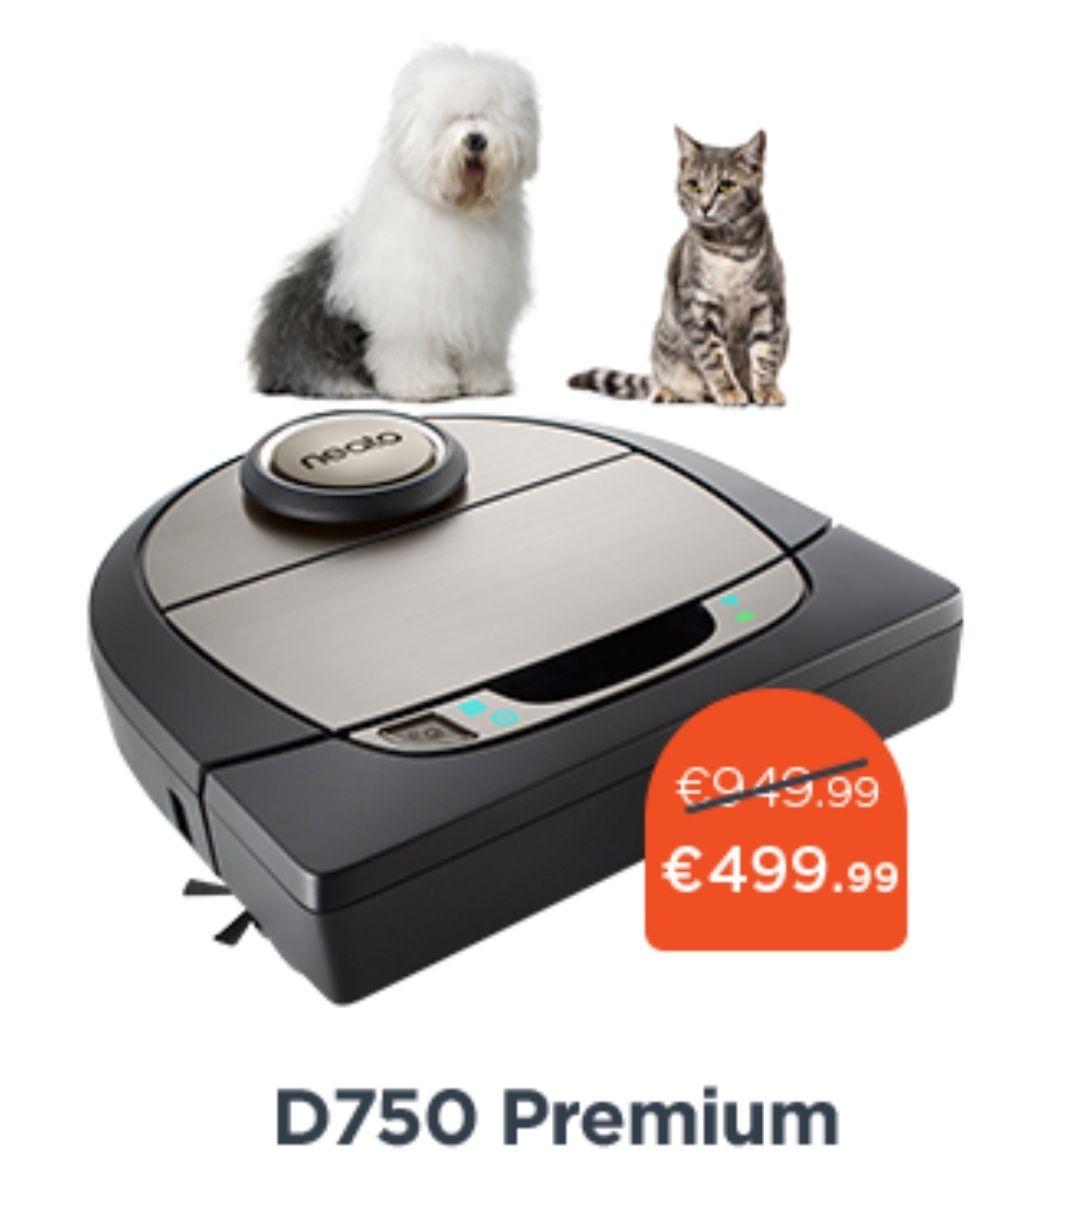 Prime Day Neato D750 Haustier Edition und weitere Neato Saugroboter